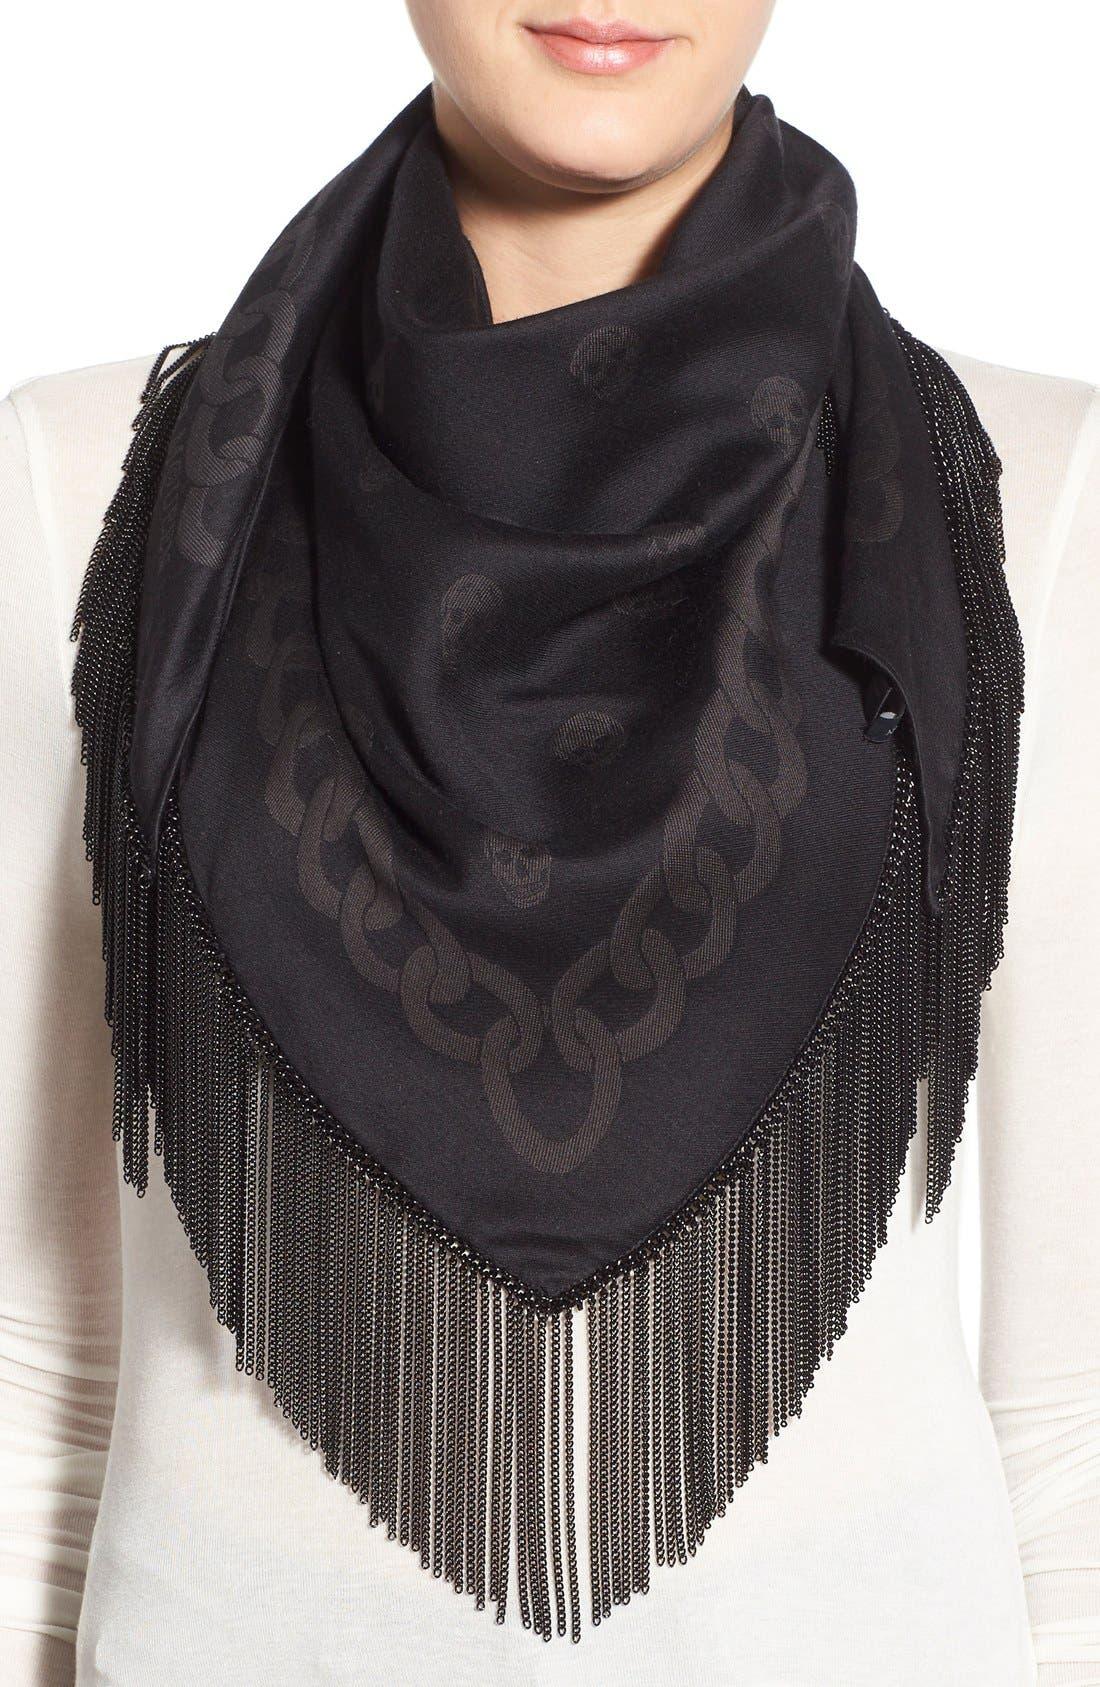 Alternate Image 1 Selected - Alexander McQueen Chain Fringe Wool & Silk Scarf